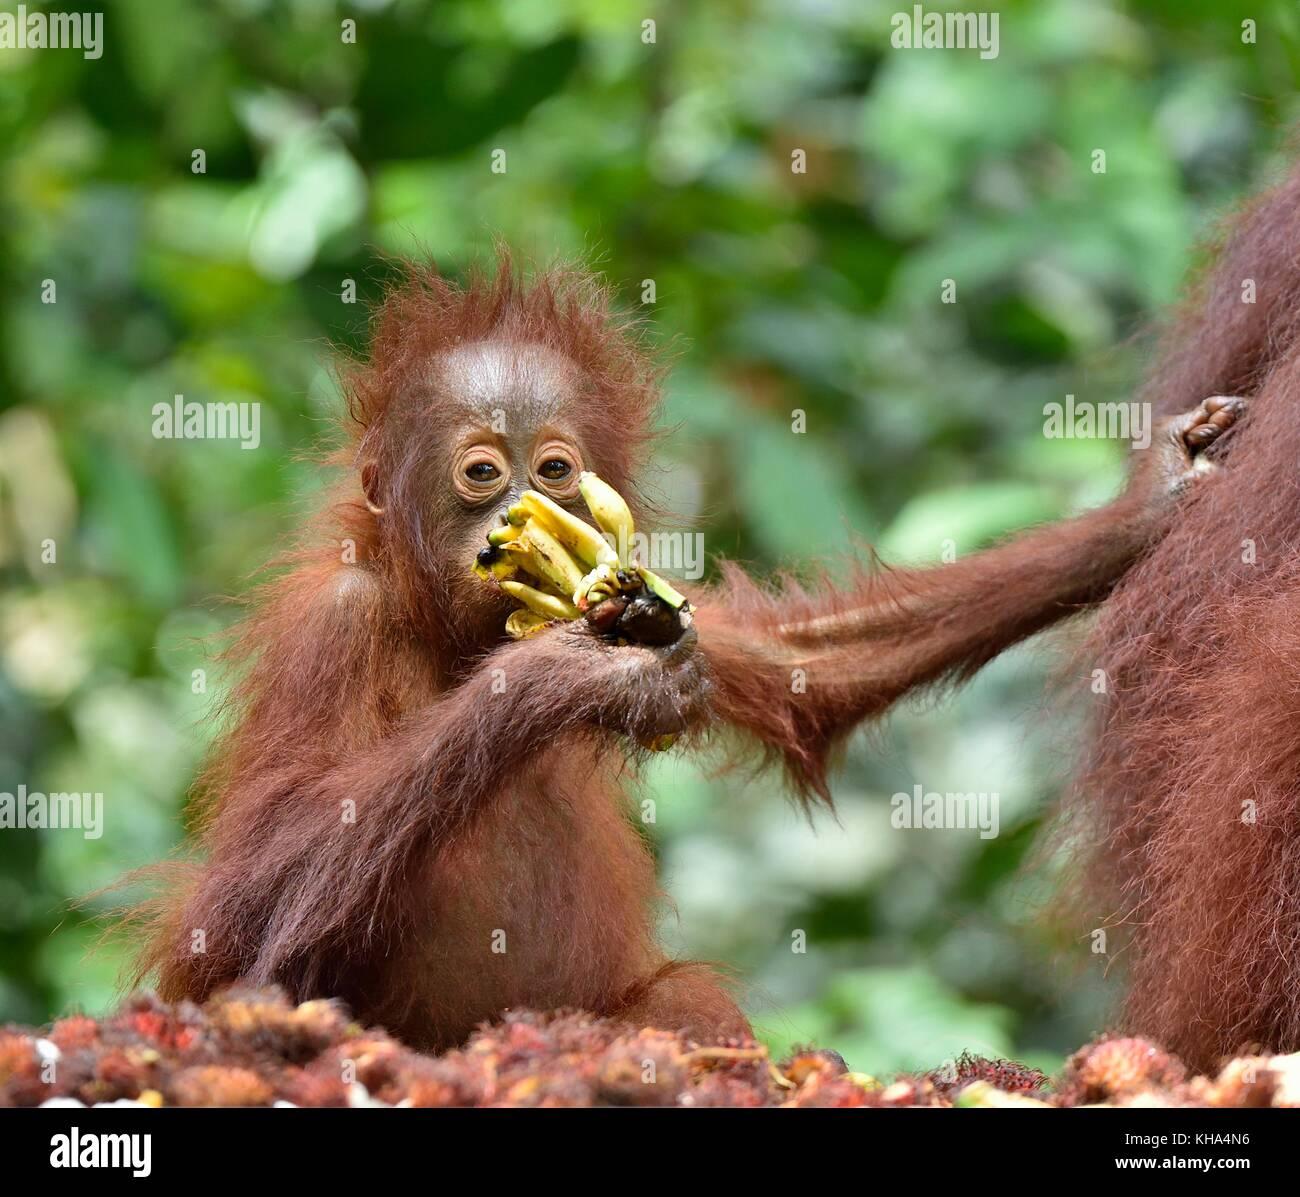 Mother orangutan and cub  eating. In a natural habitat area. Bornean orangutan (Pongo  pygmaeus wurmbii) in the - Stock Image